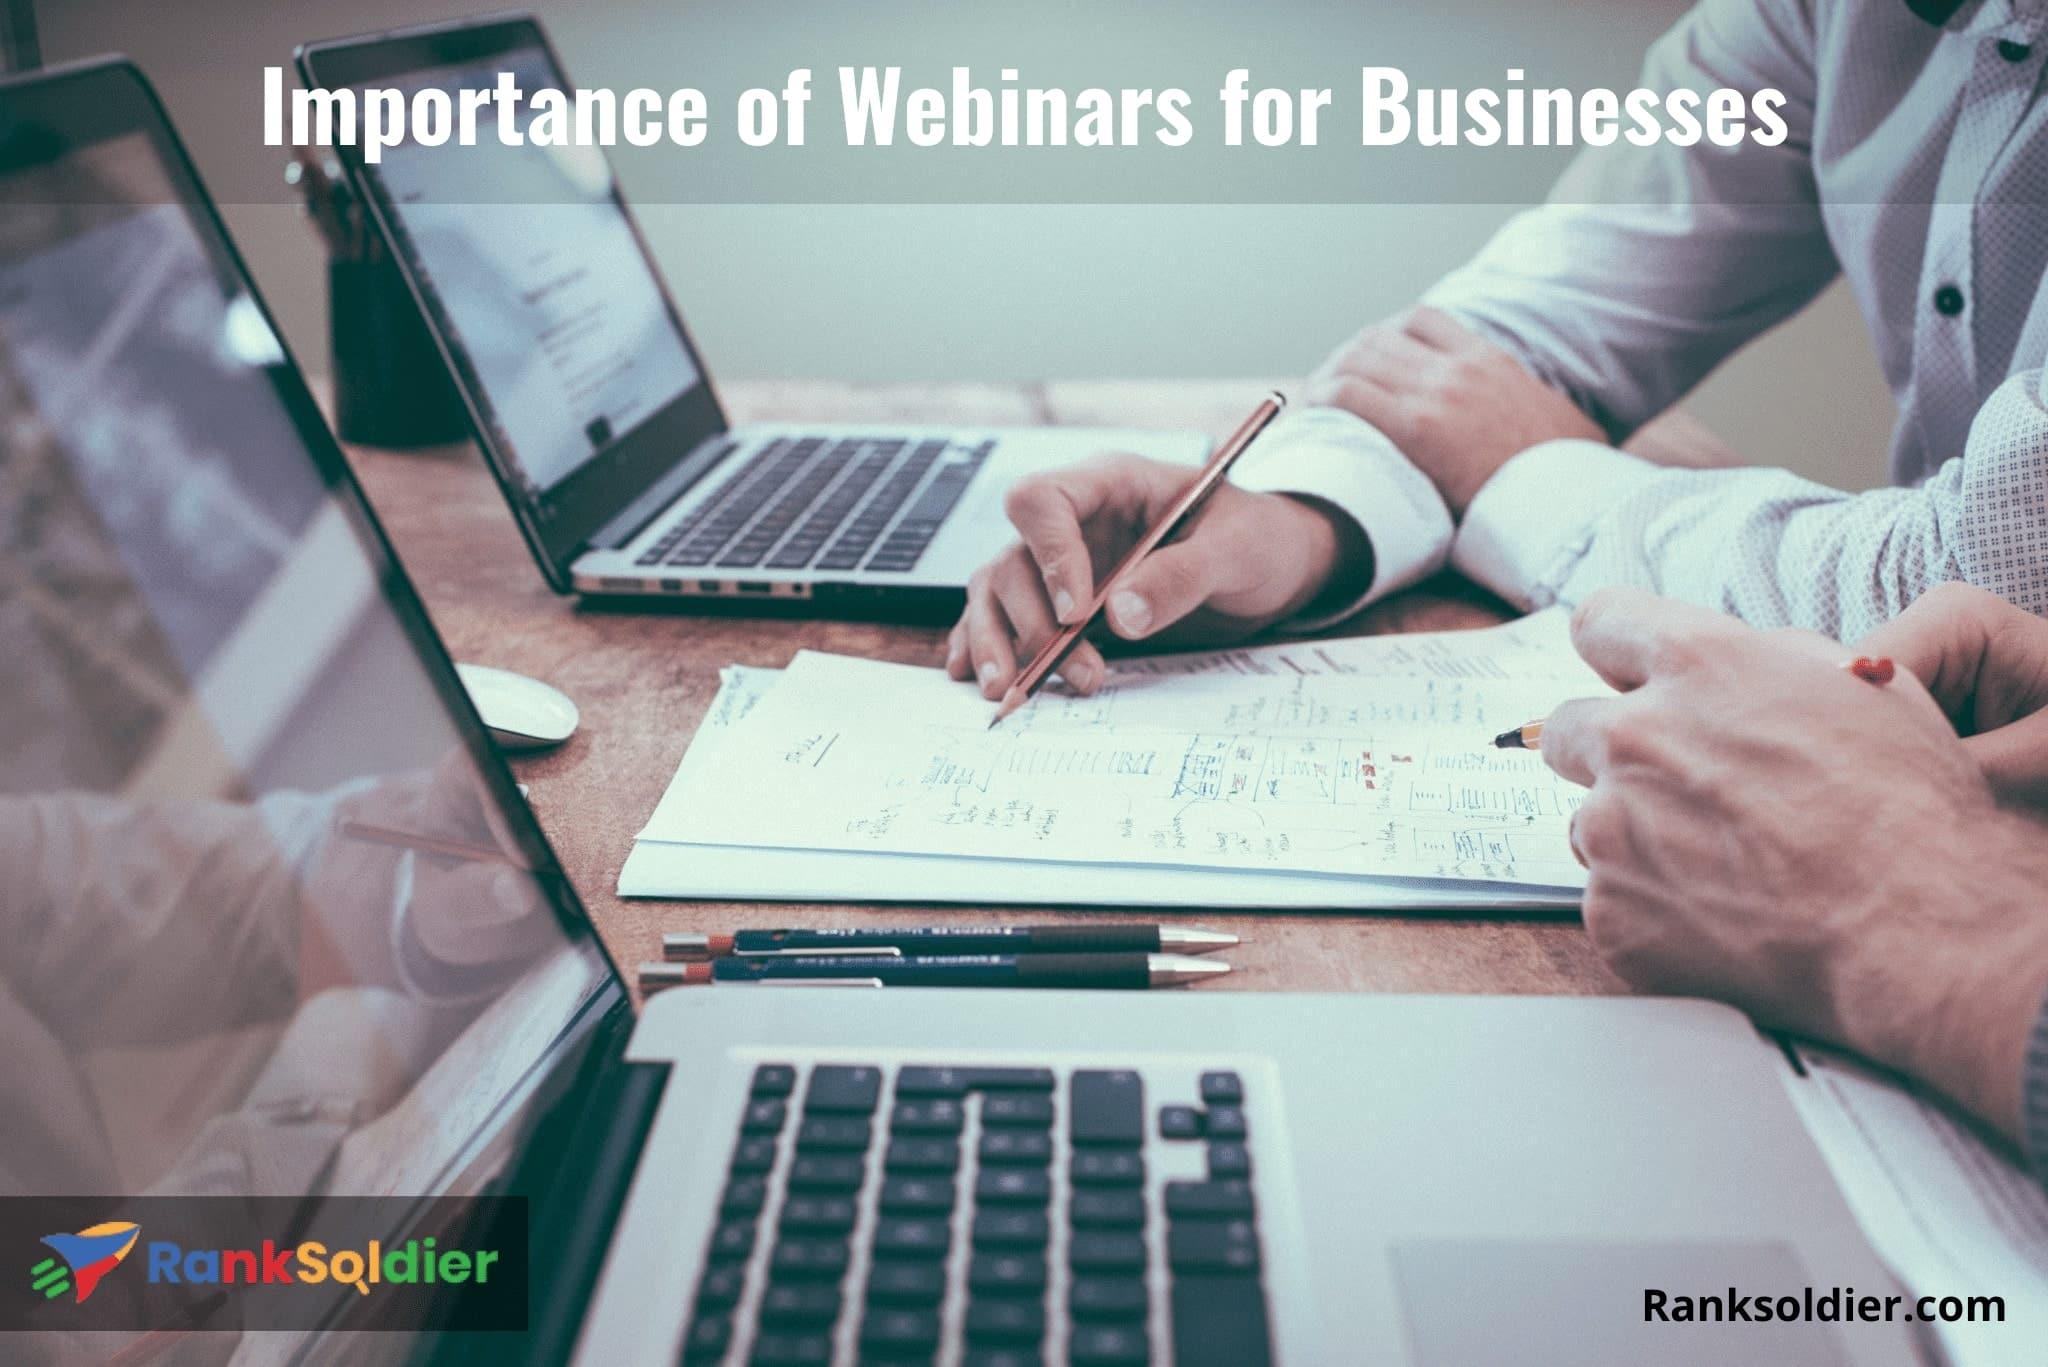 Importance of Webinars for Businesses